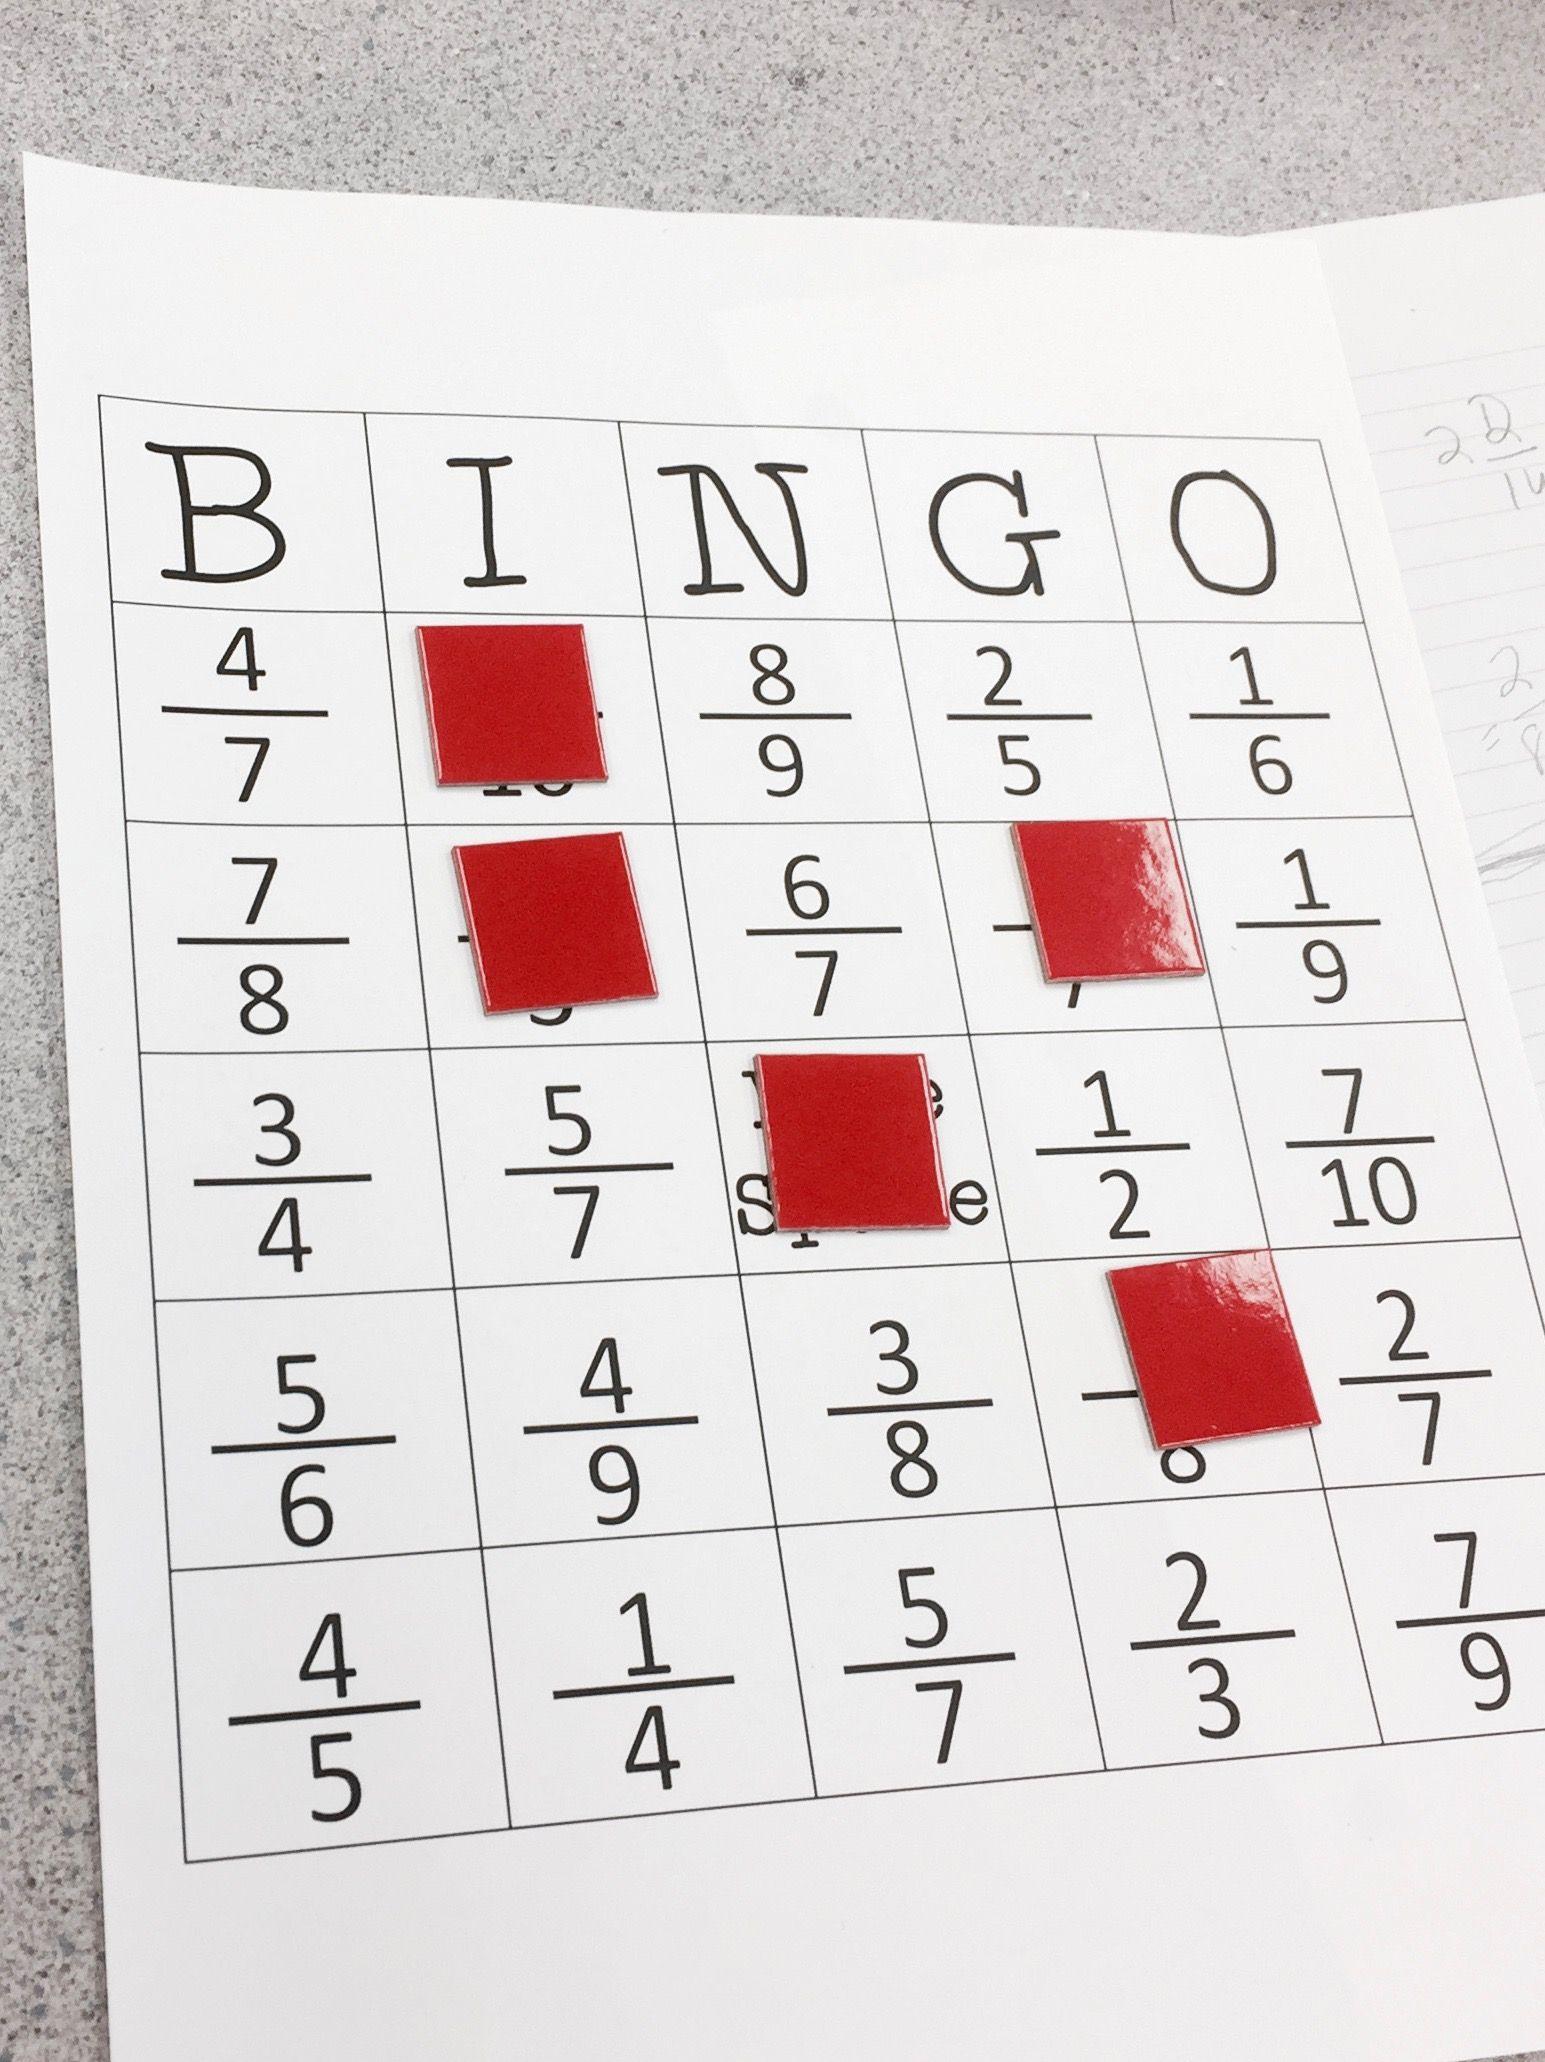 Equivalent Fraction Bingo   Fractions, Math, Equivalent